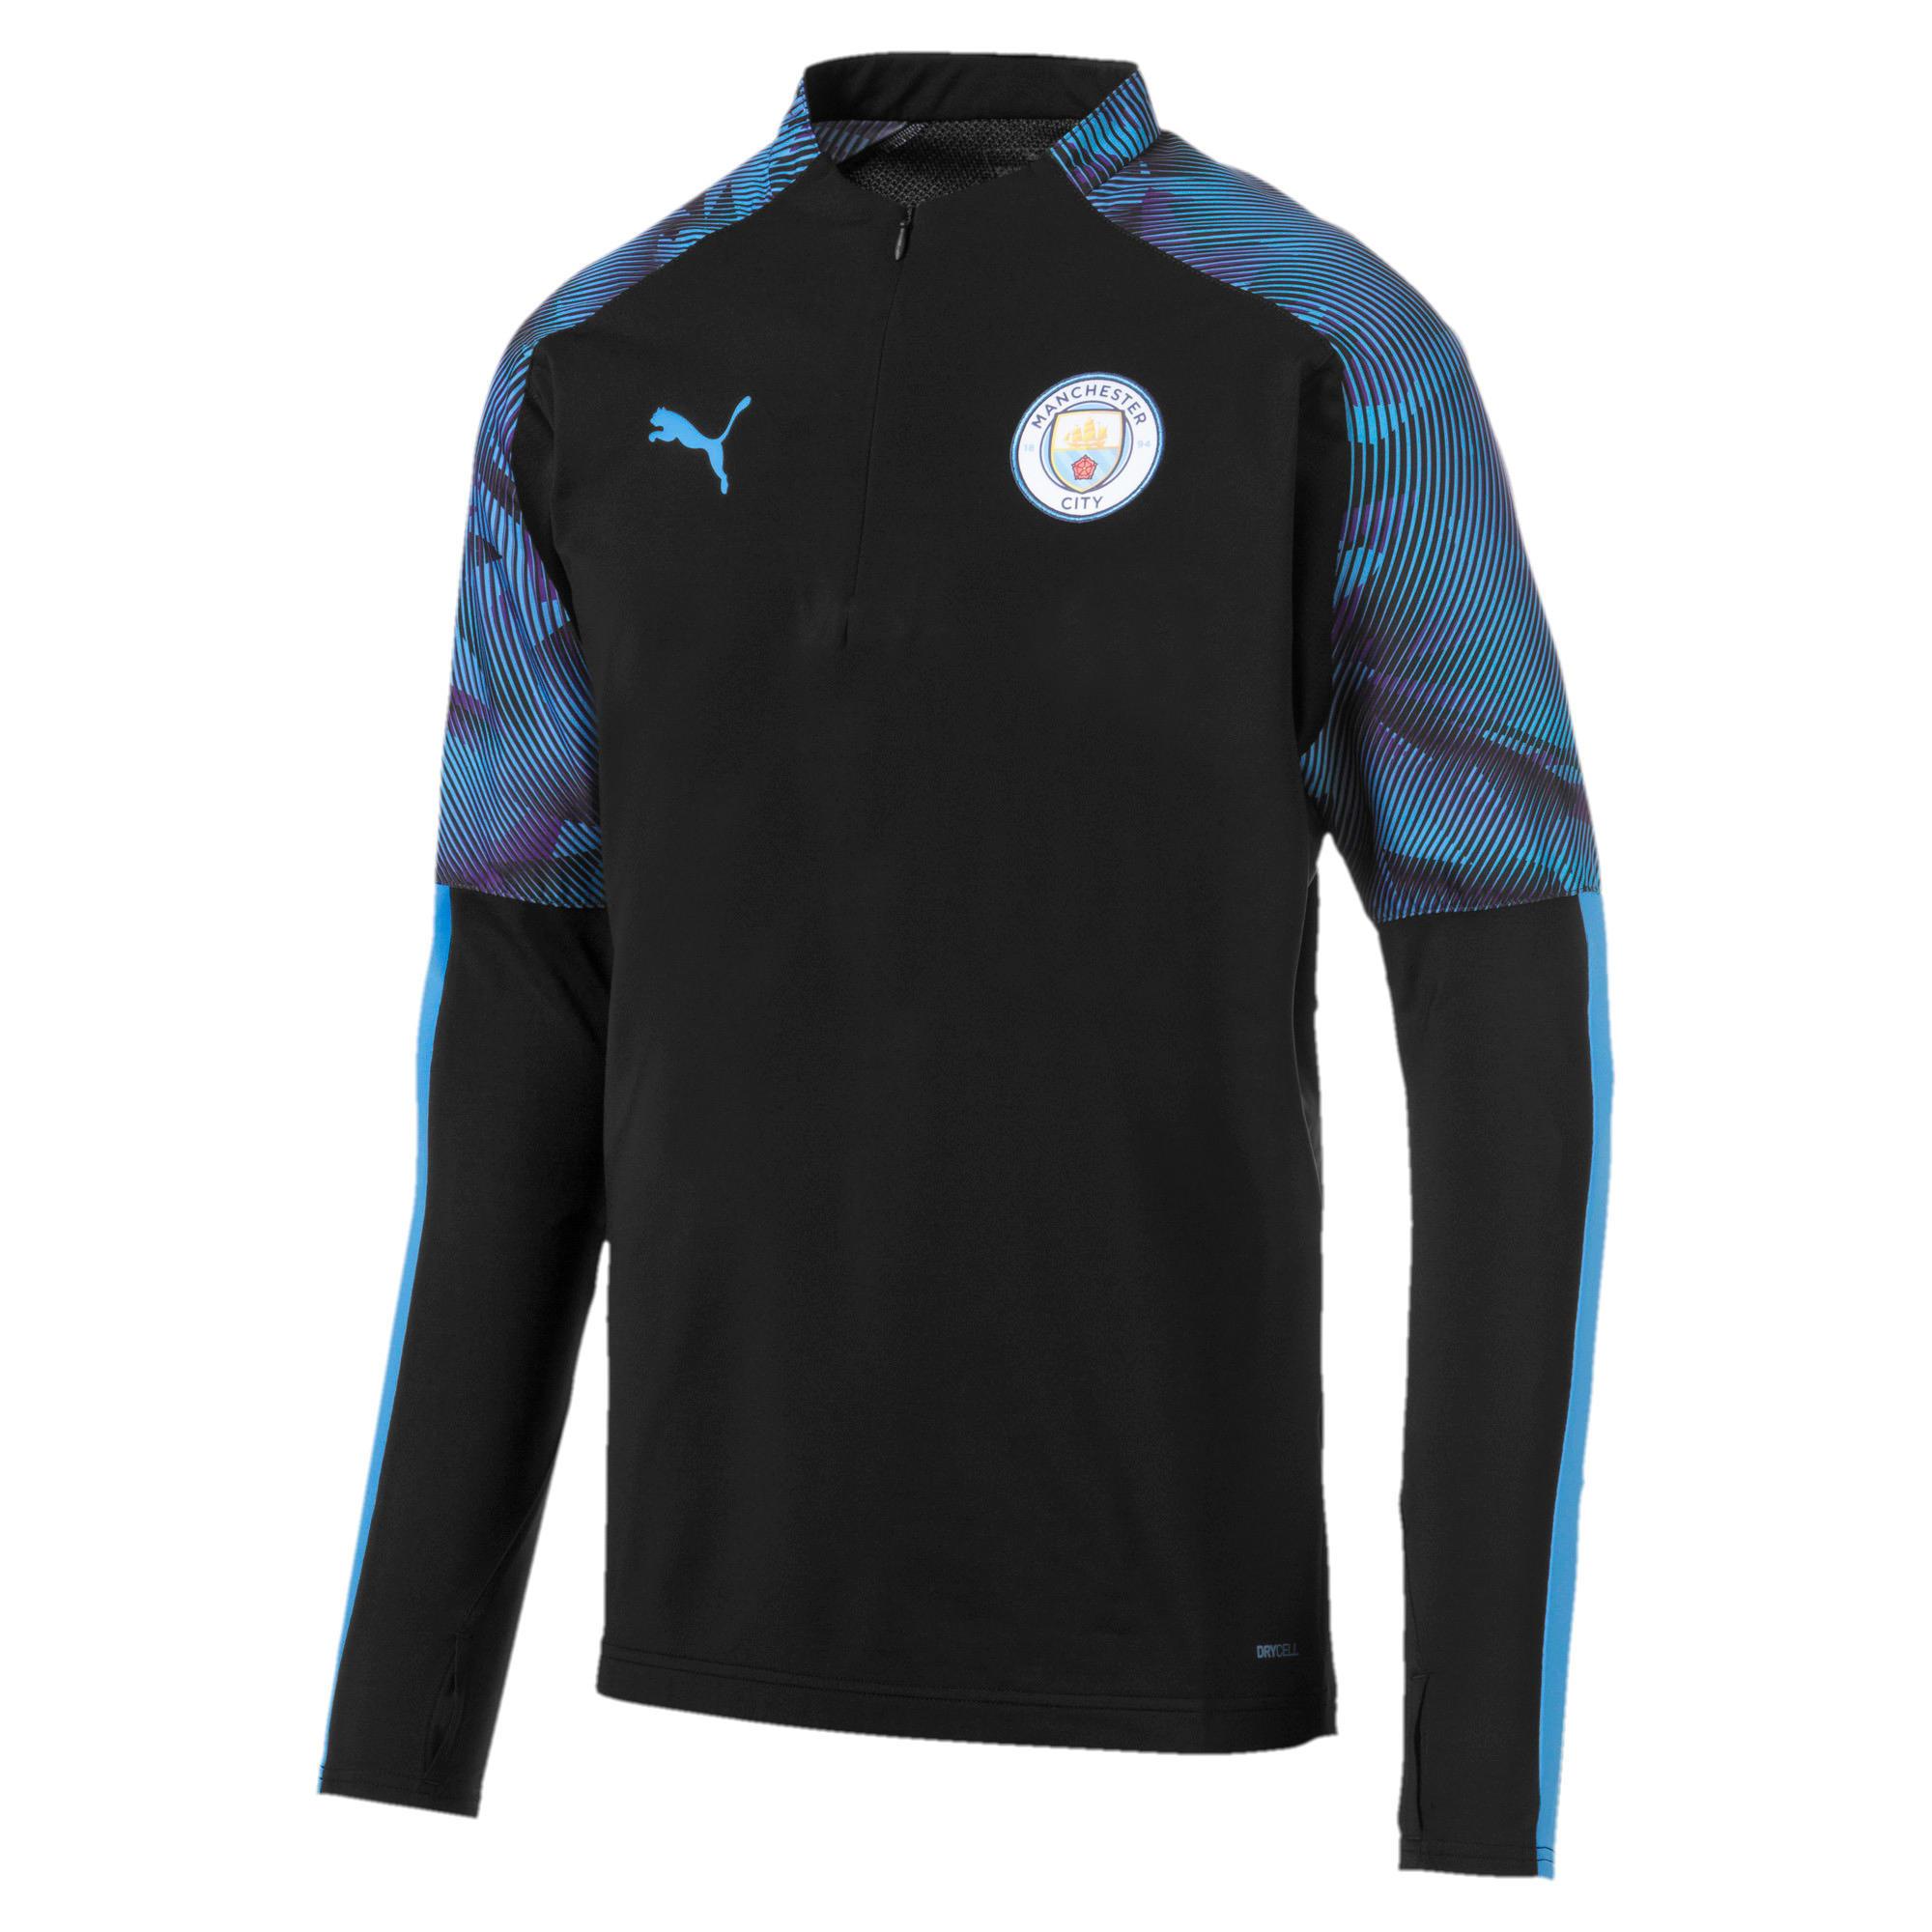 Thumbnail 1 of Manchester City FC Quarter Zip Men's Top, Puma Black-Team Light Blue, medium